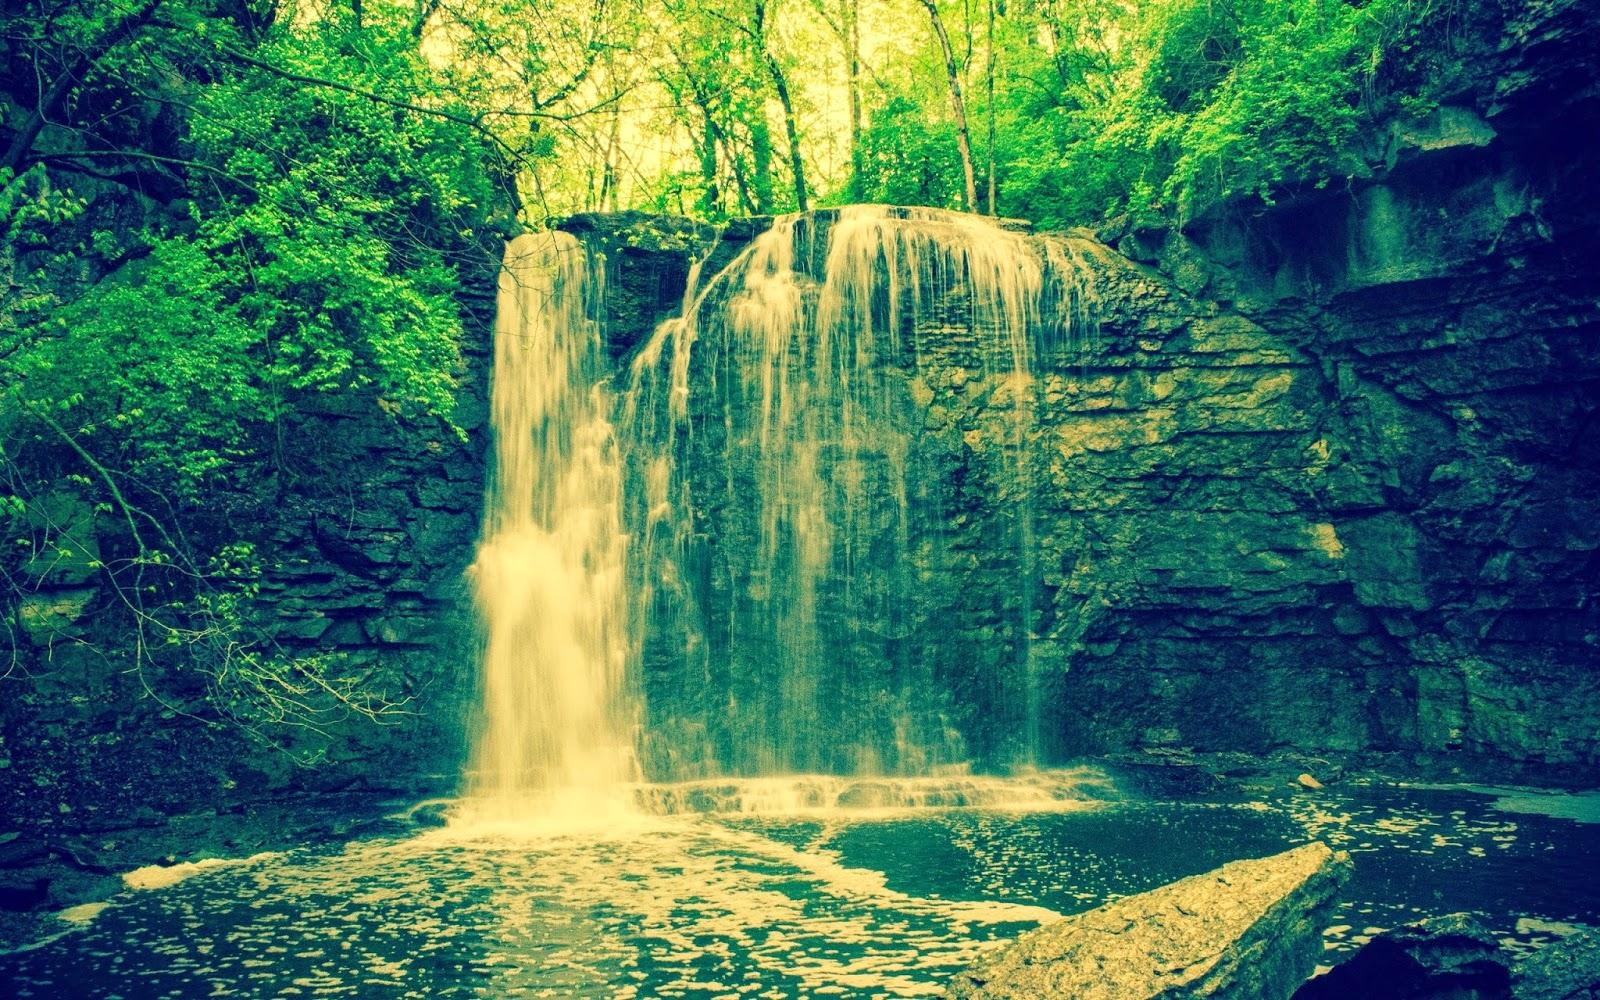 1200x1600 Wallpaper Hd: Unseen Waterfall In Forest Wallpaper